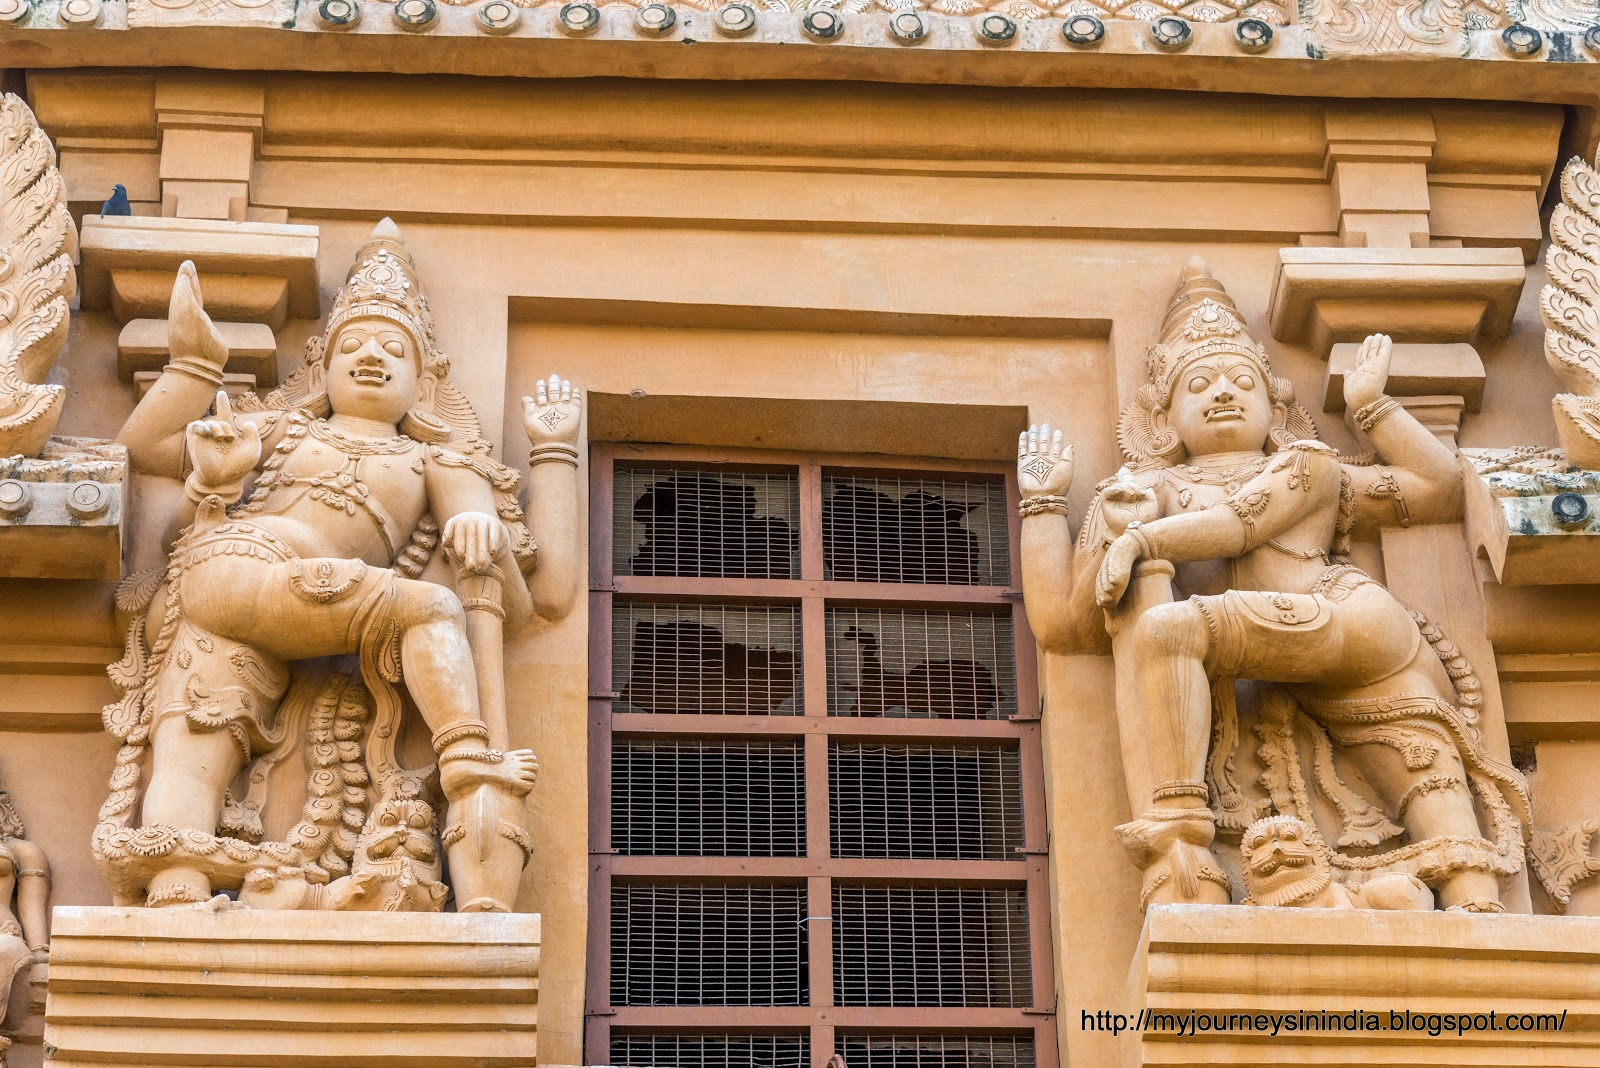 Thanjavur Brihadeeswarar Temple Tower sculptures dwarapalaka